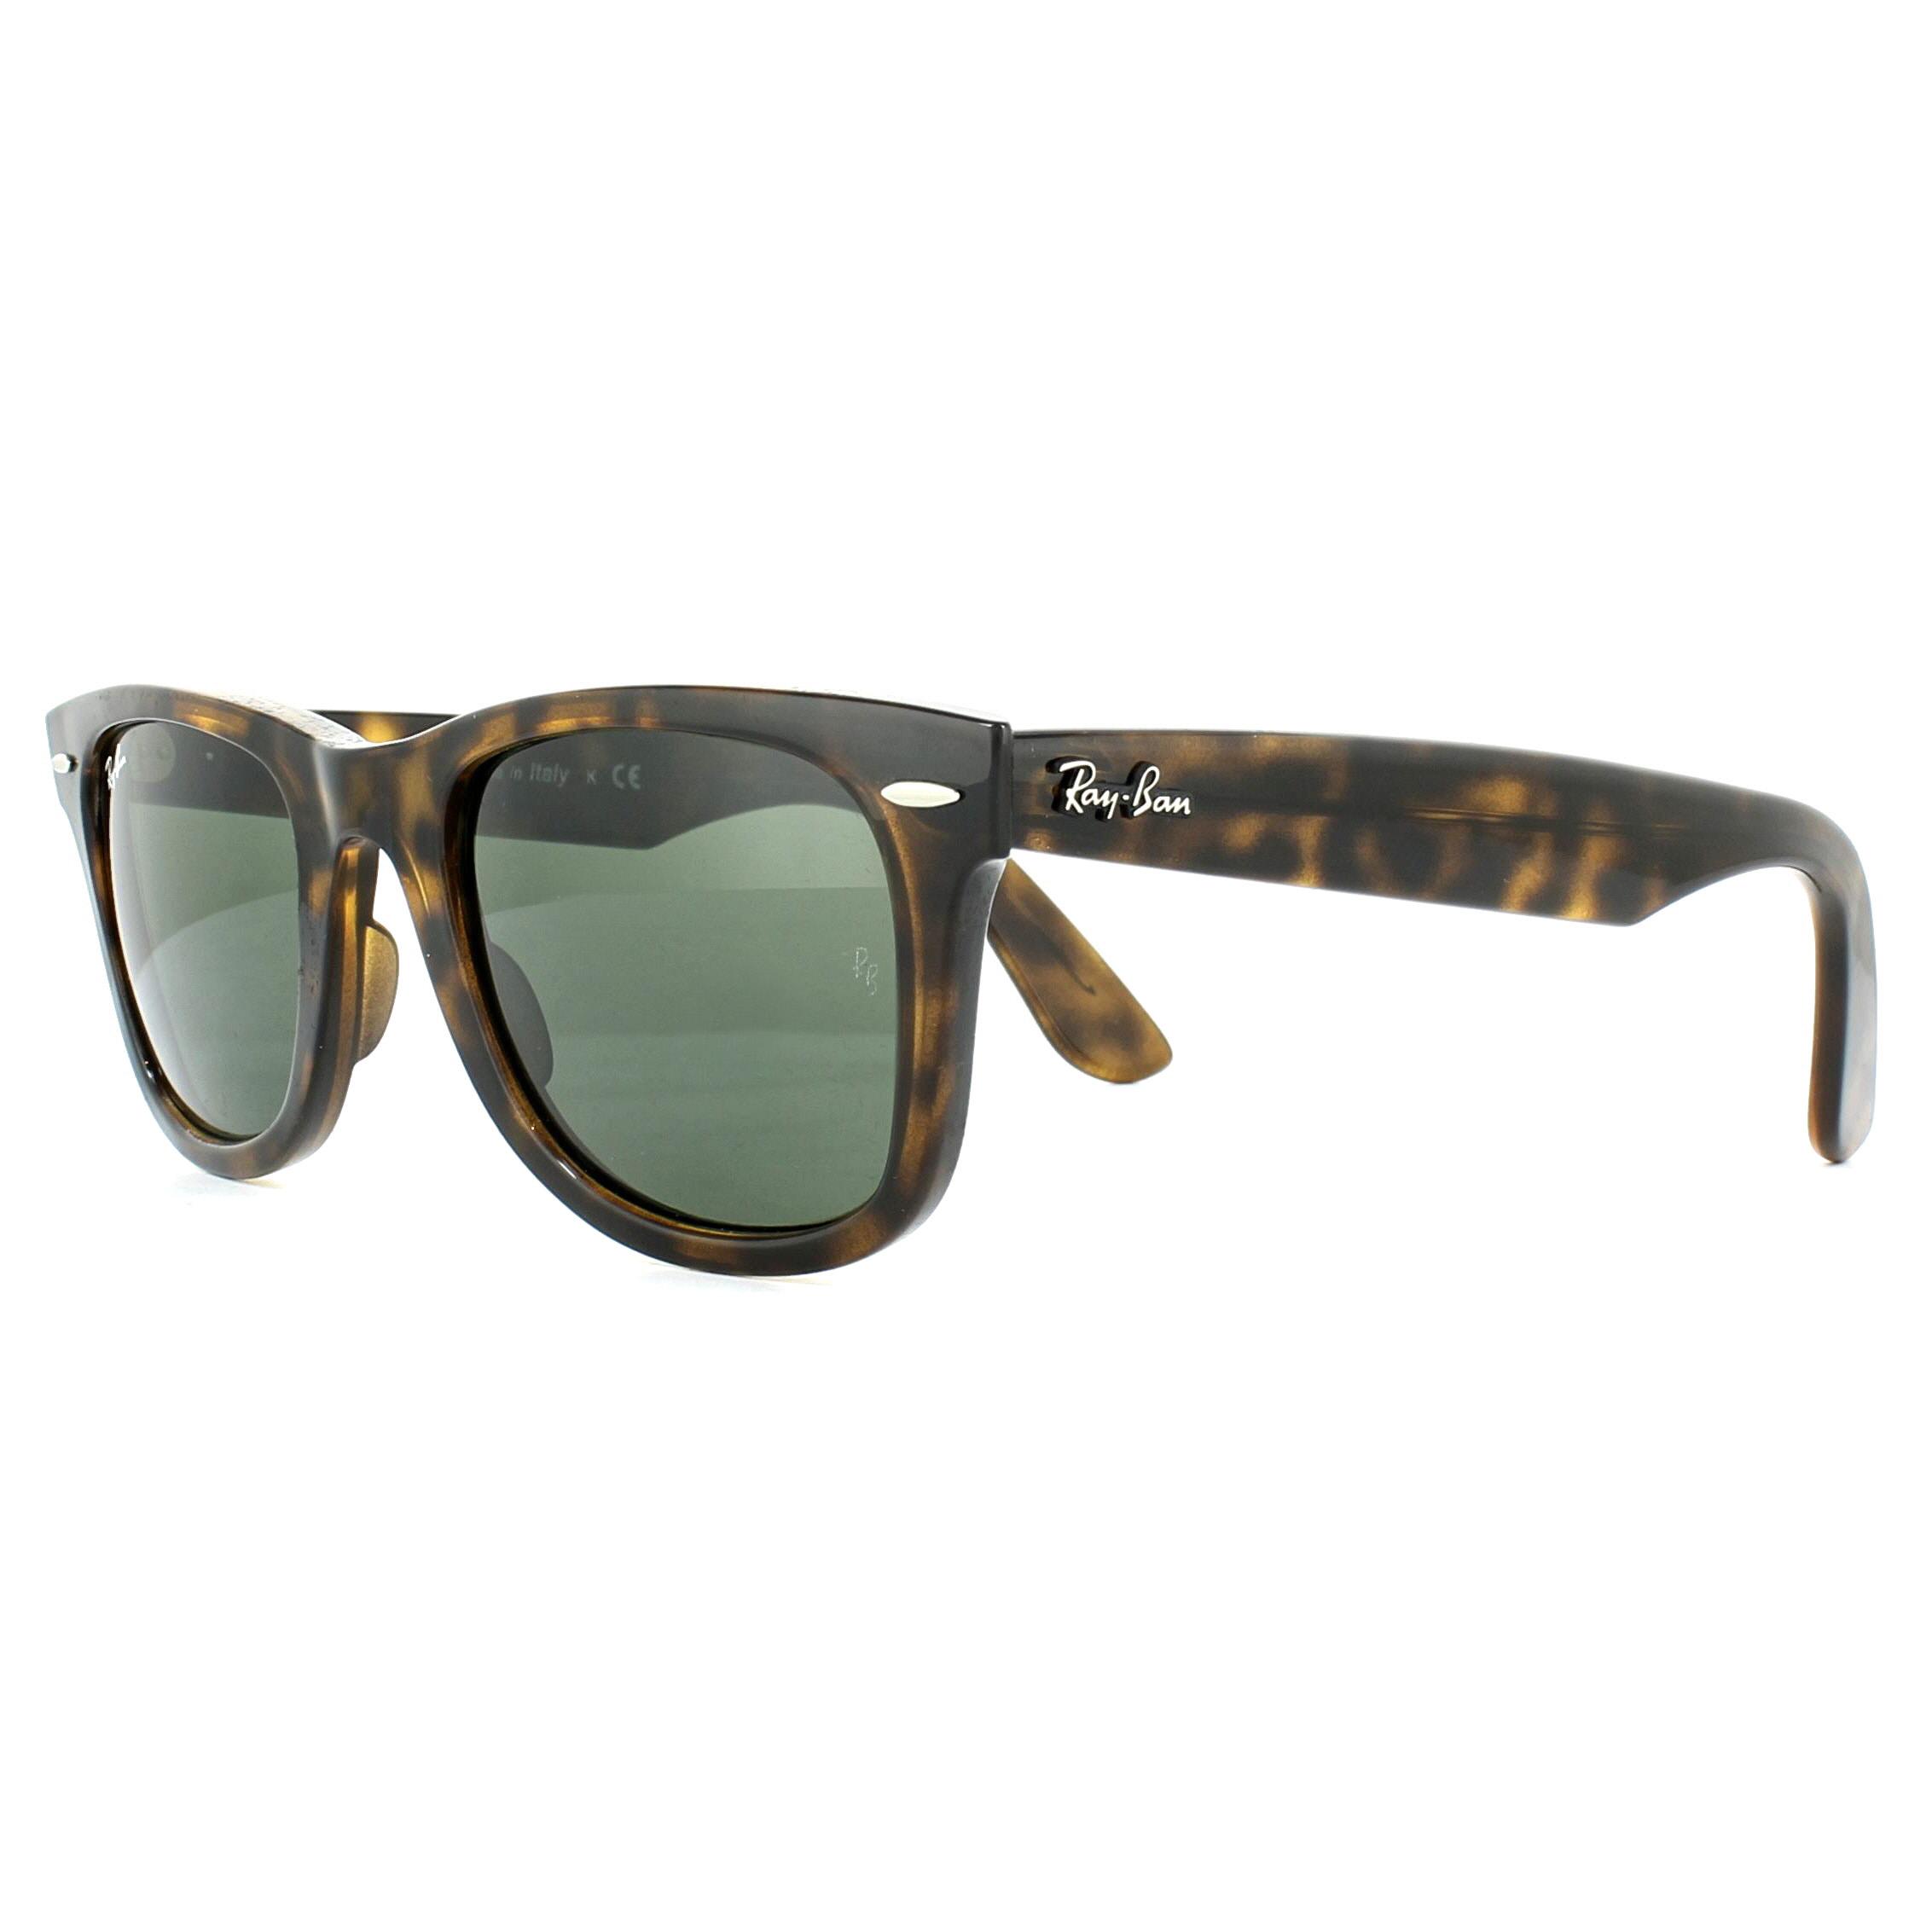 d7d237c29c Sentinel Ray-Ban Sunglasses Wayfarer Ease RB4340 710 Tortoise Green G-15